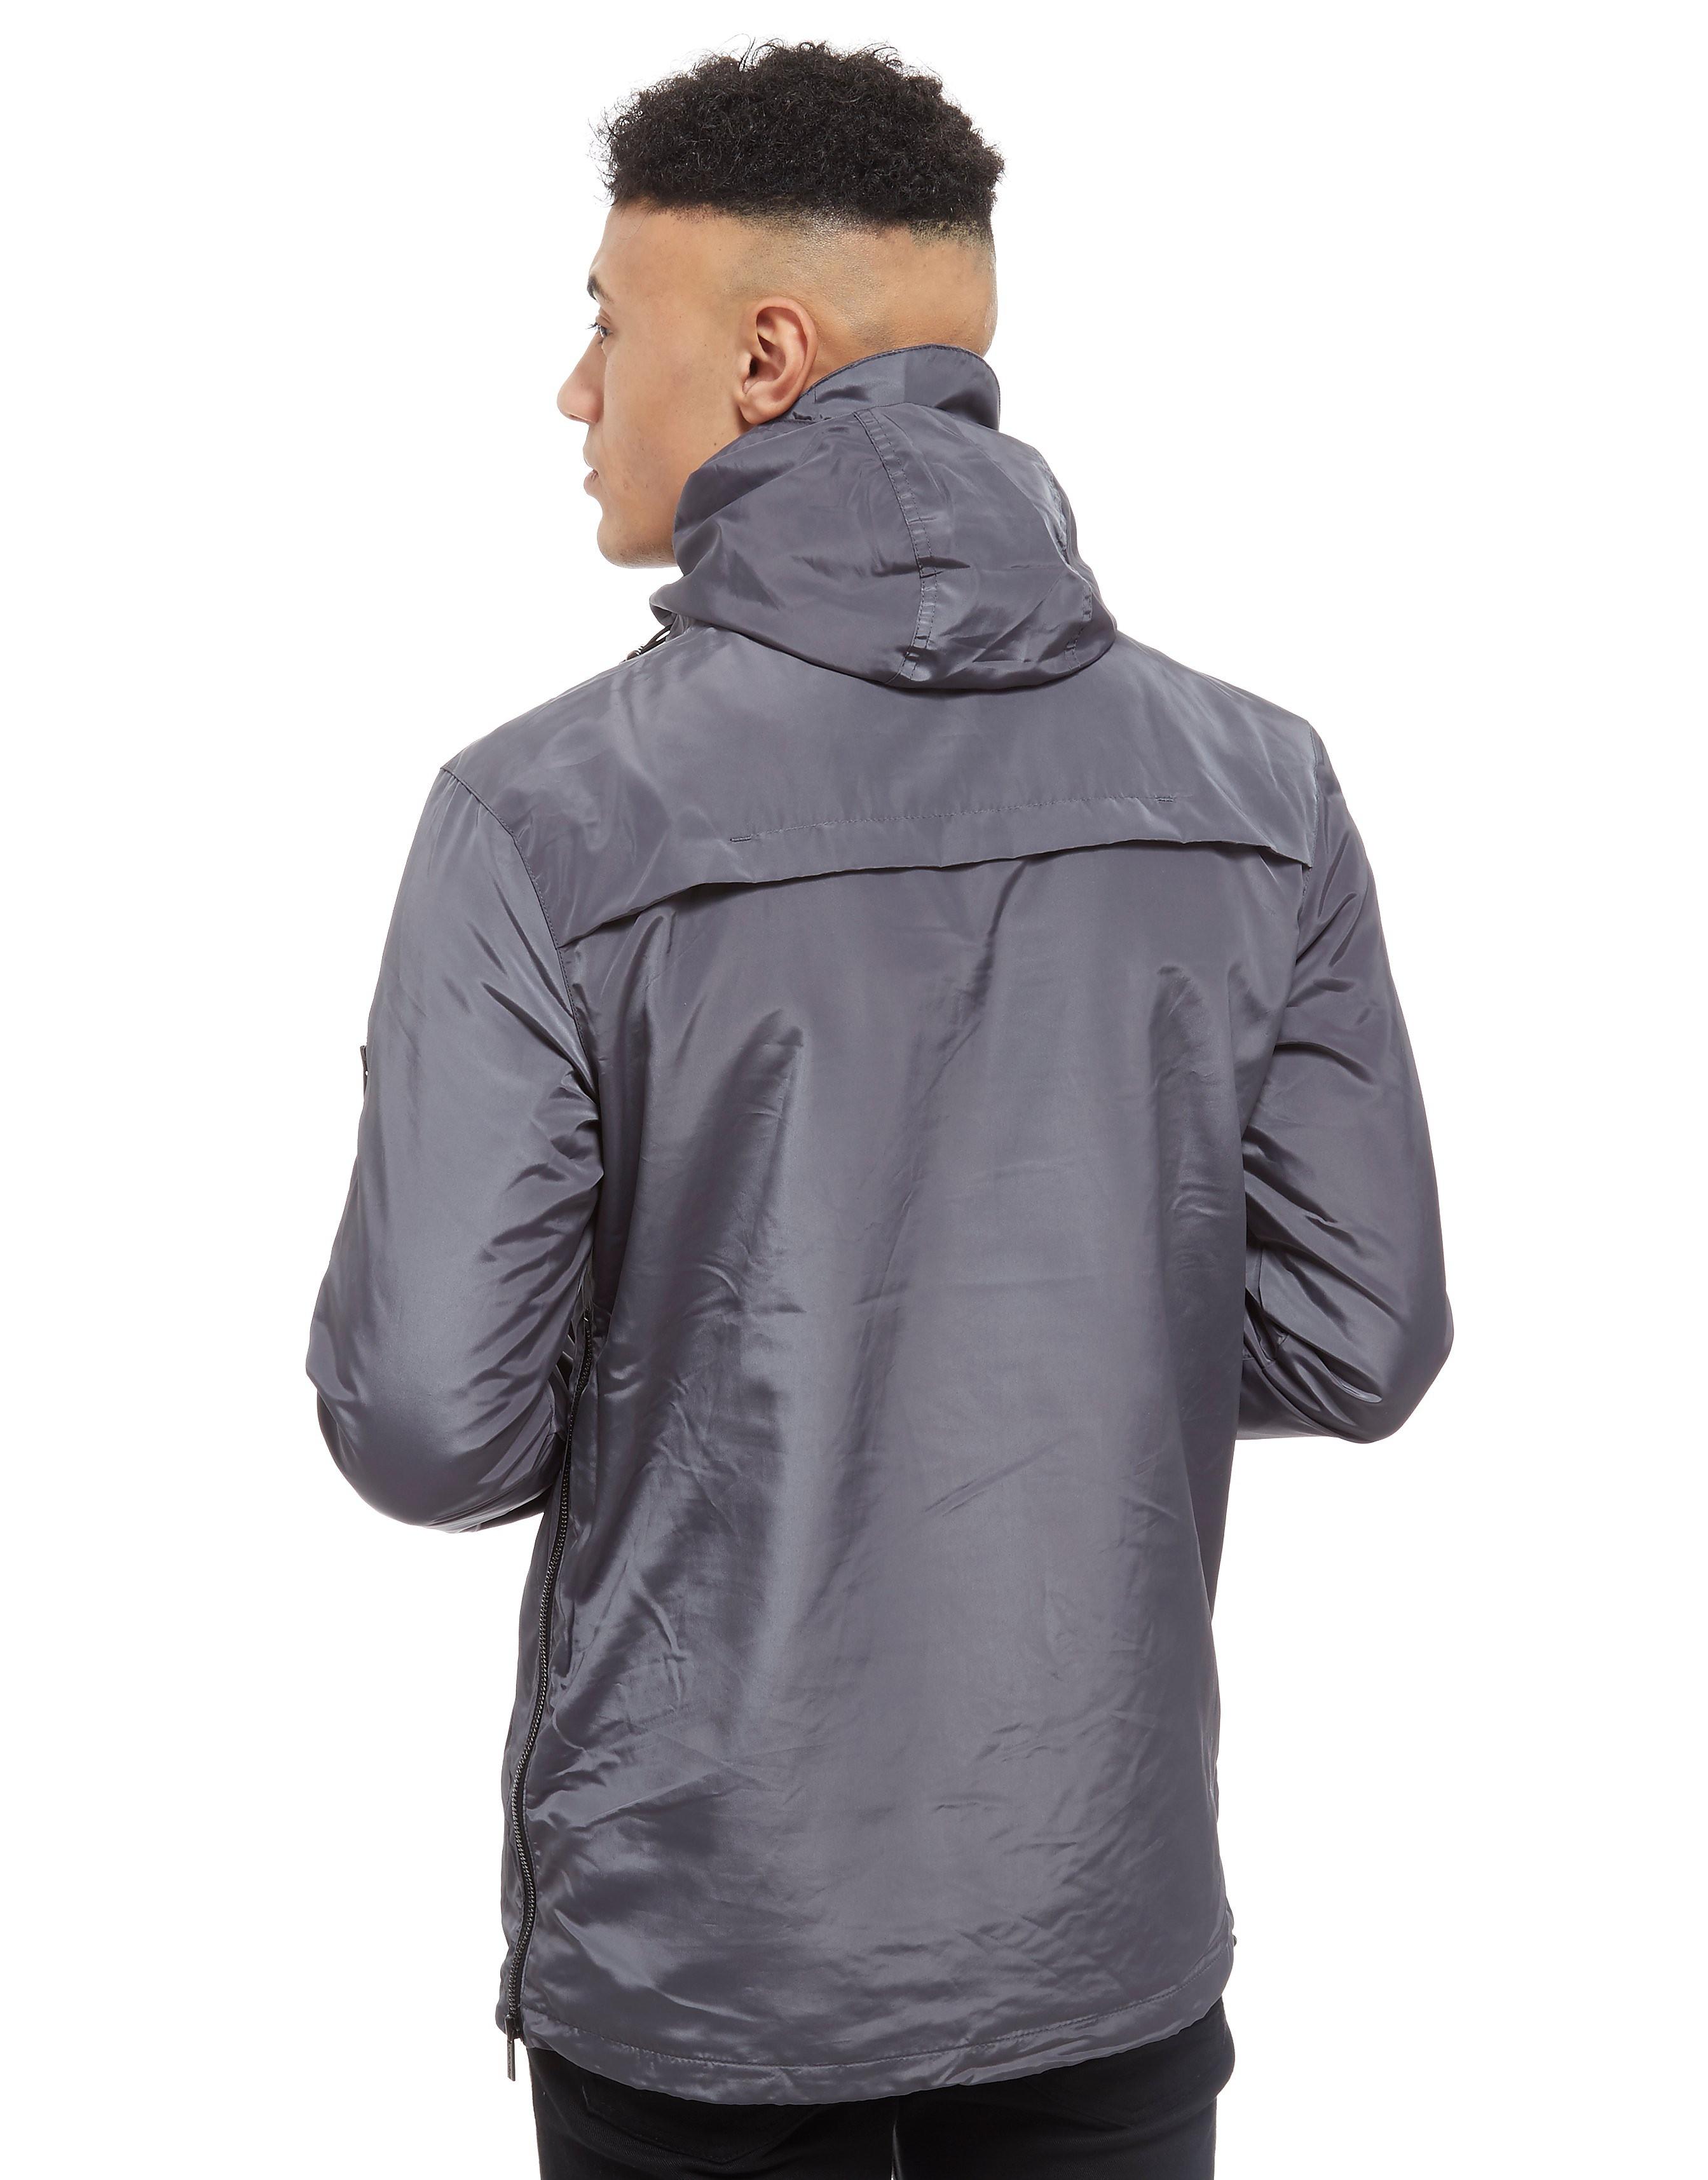 11 Degrees 1/4 Zip Jacket